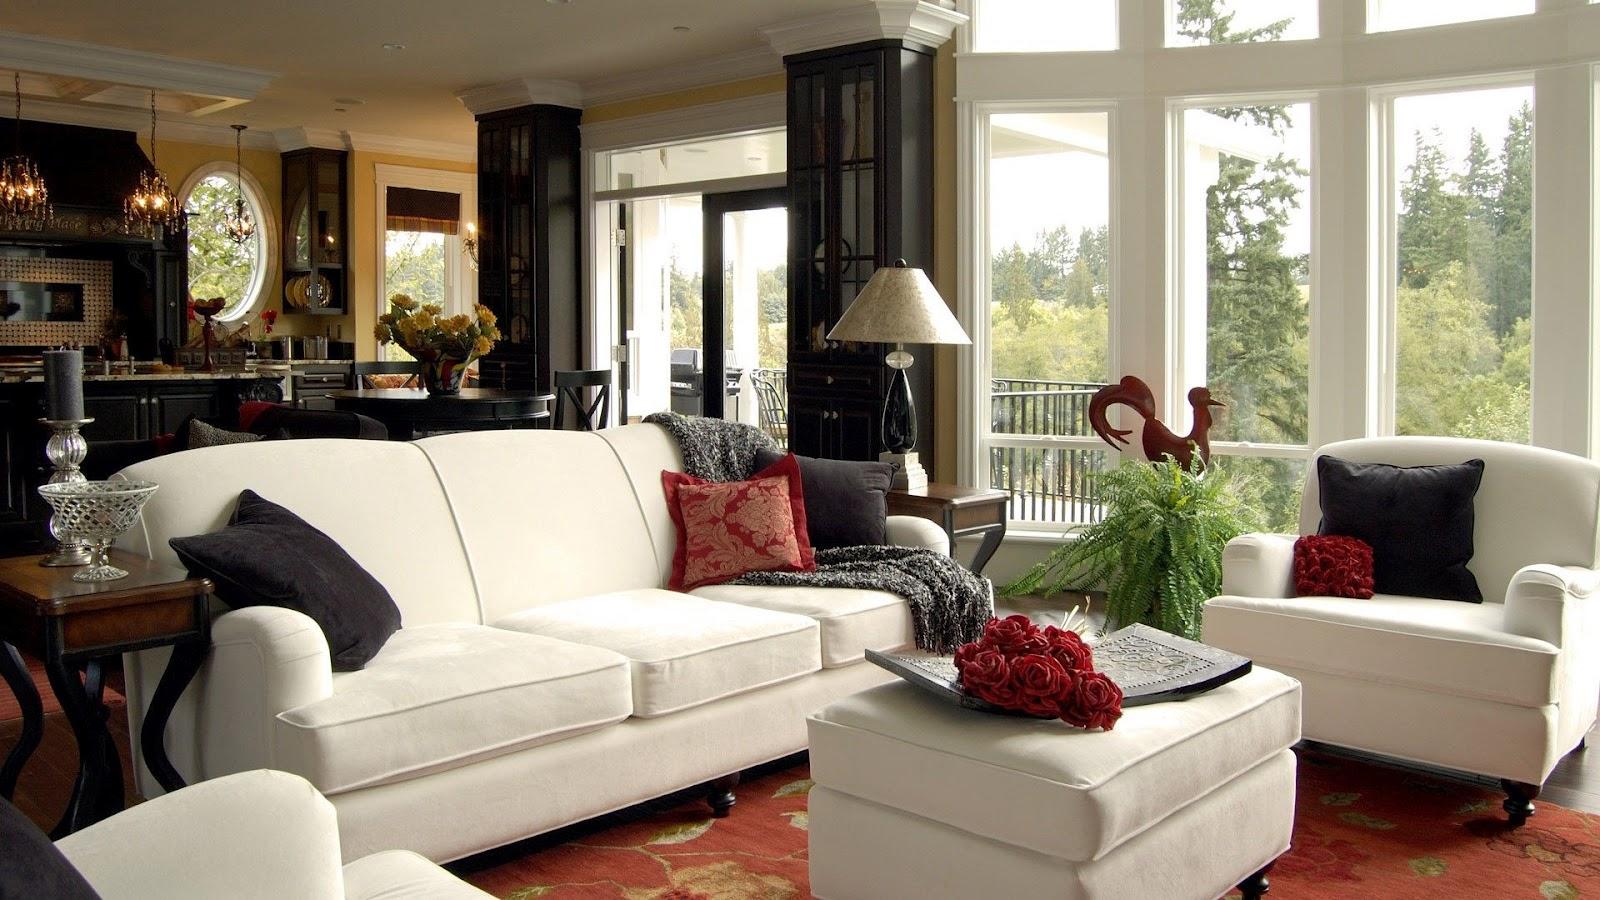 Warm house design HD desktop wallpapers | FULL HD (High Definition ...